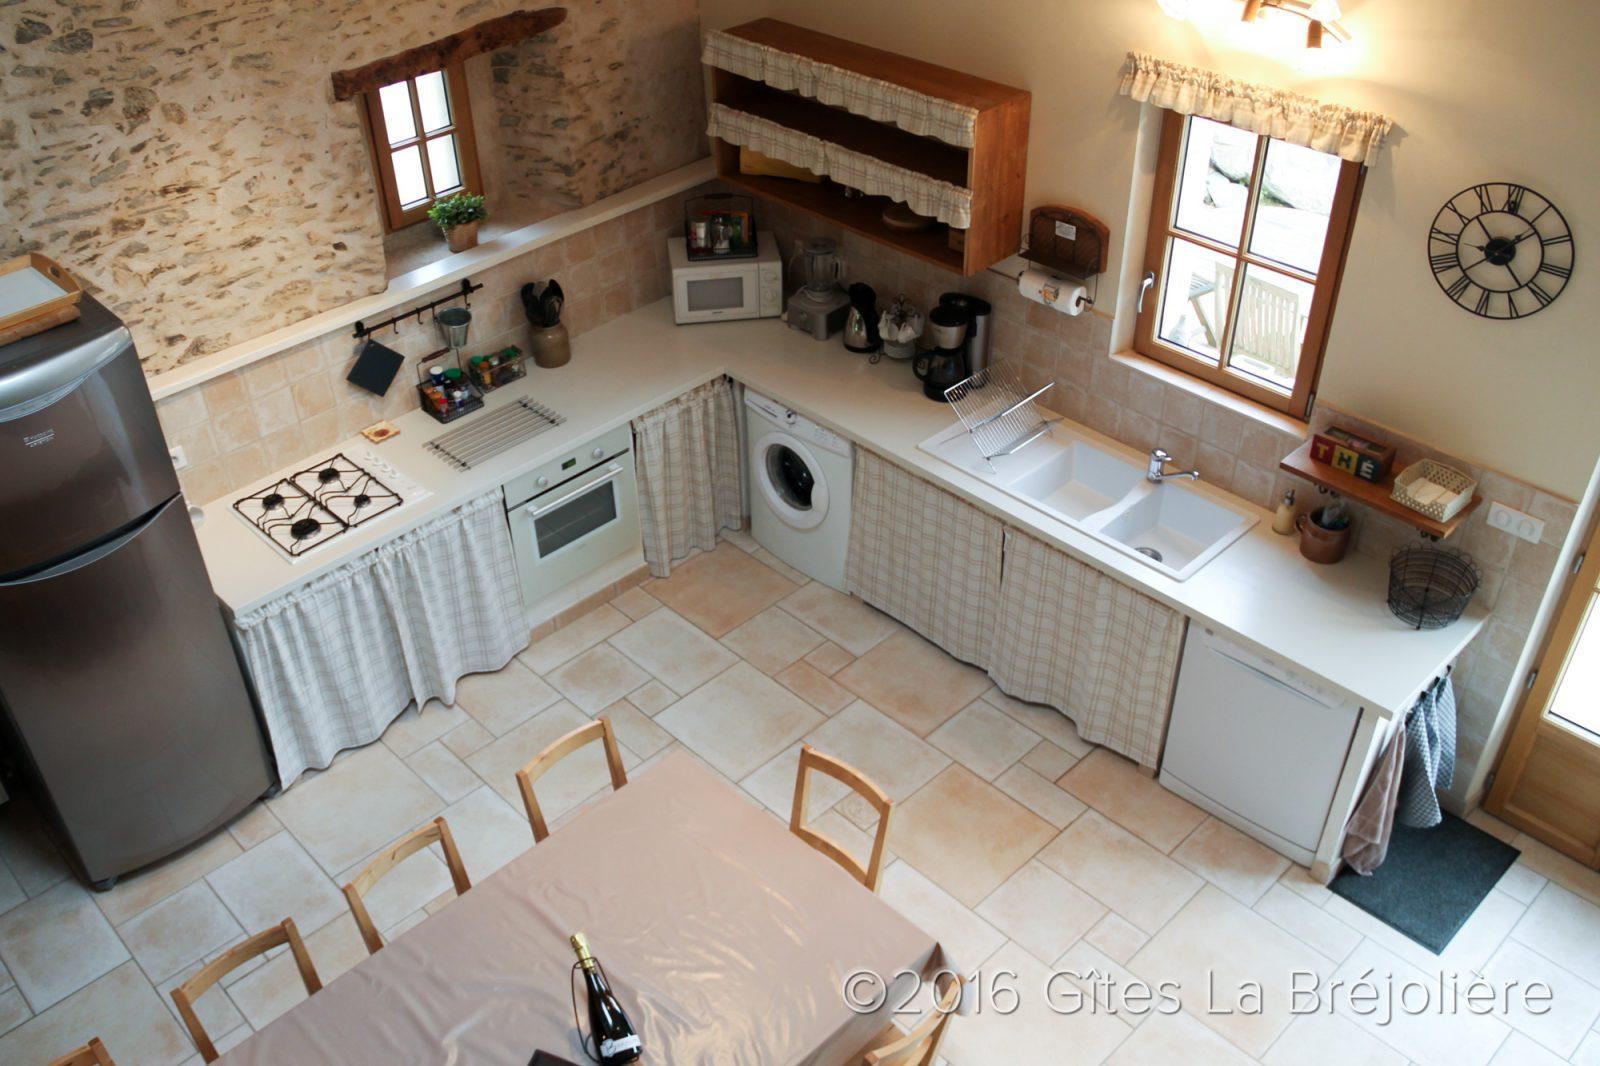 recouvrir plan de travail cuisine elegant good recouvrir carrelage plan de travail cuisine pour. Black Bedroom Furniture Sets. Home Design Ideas